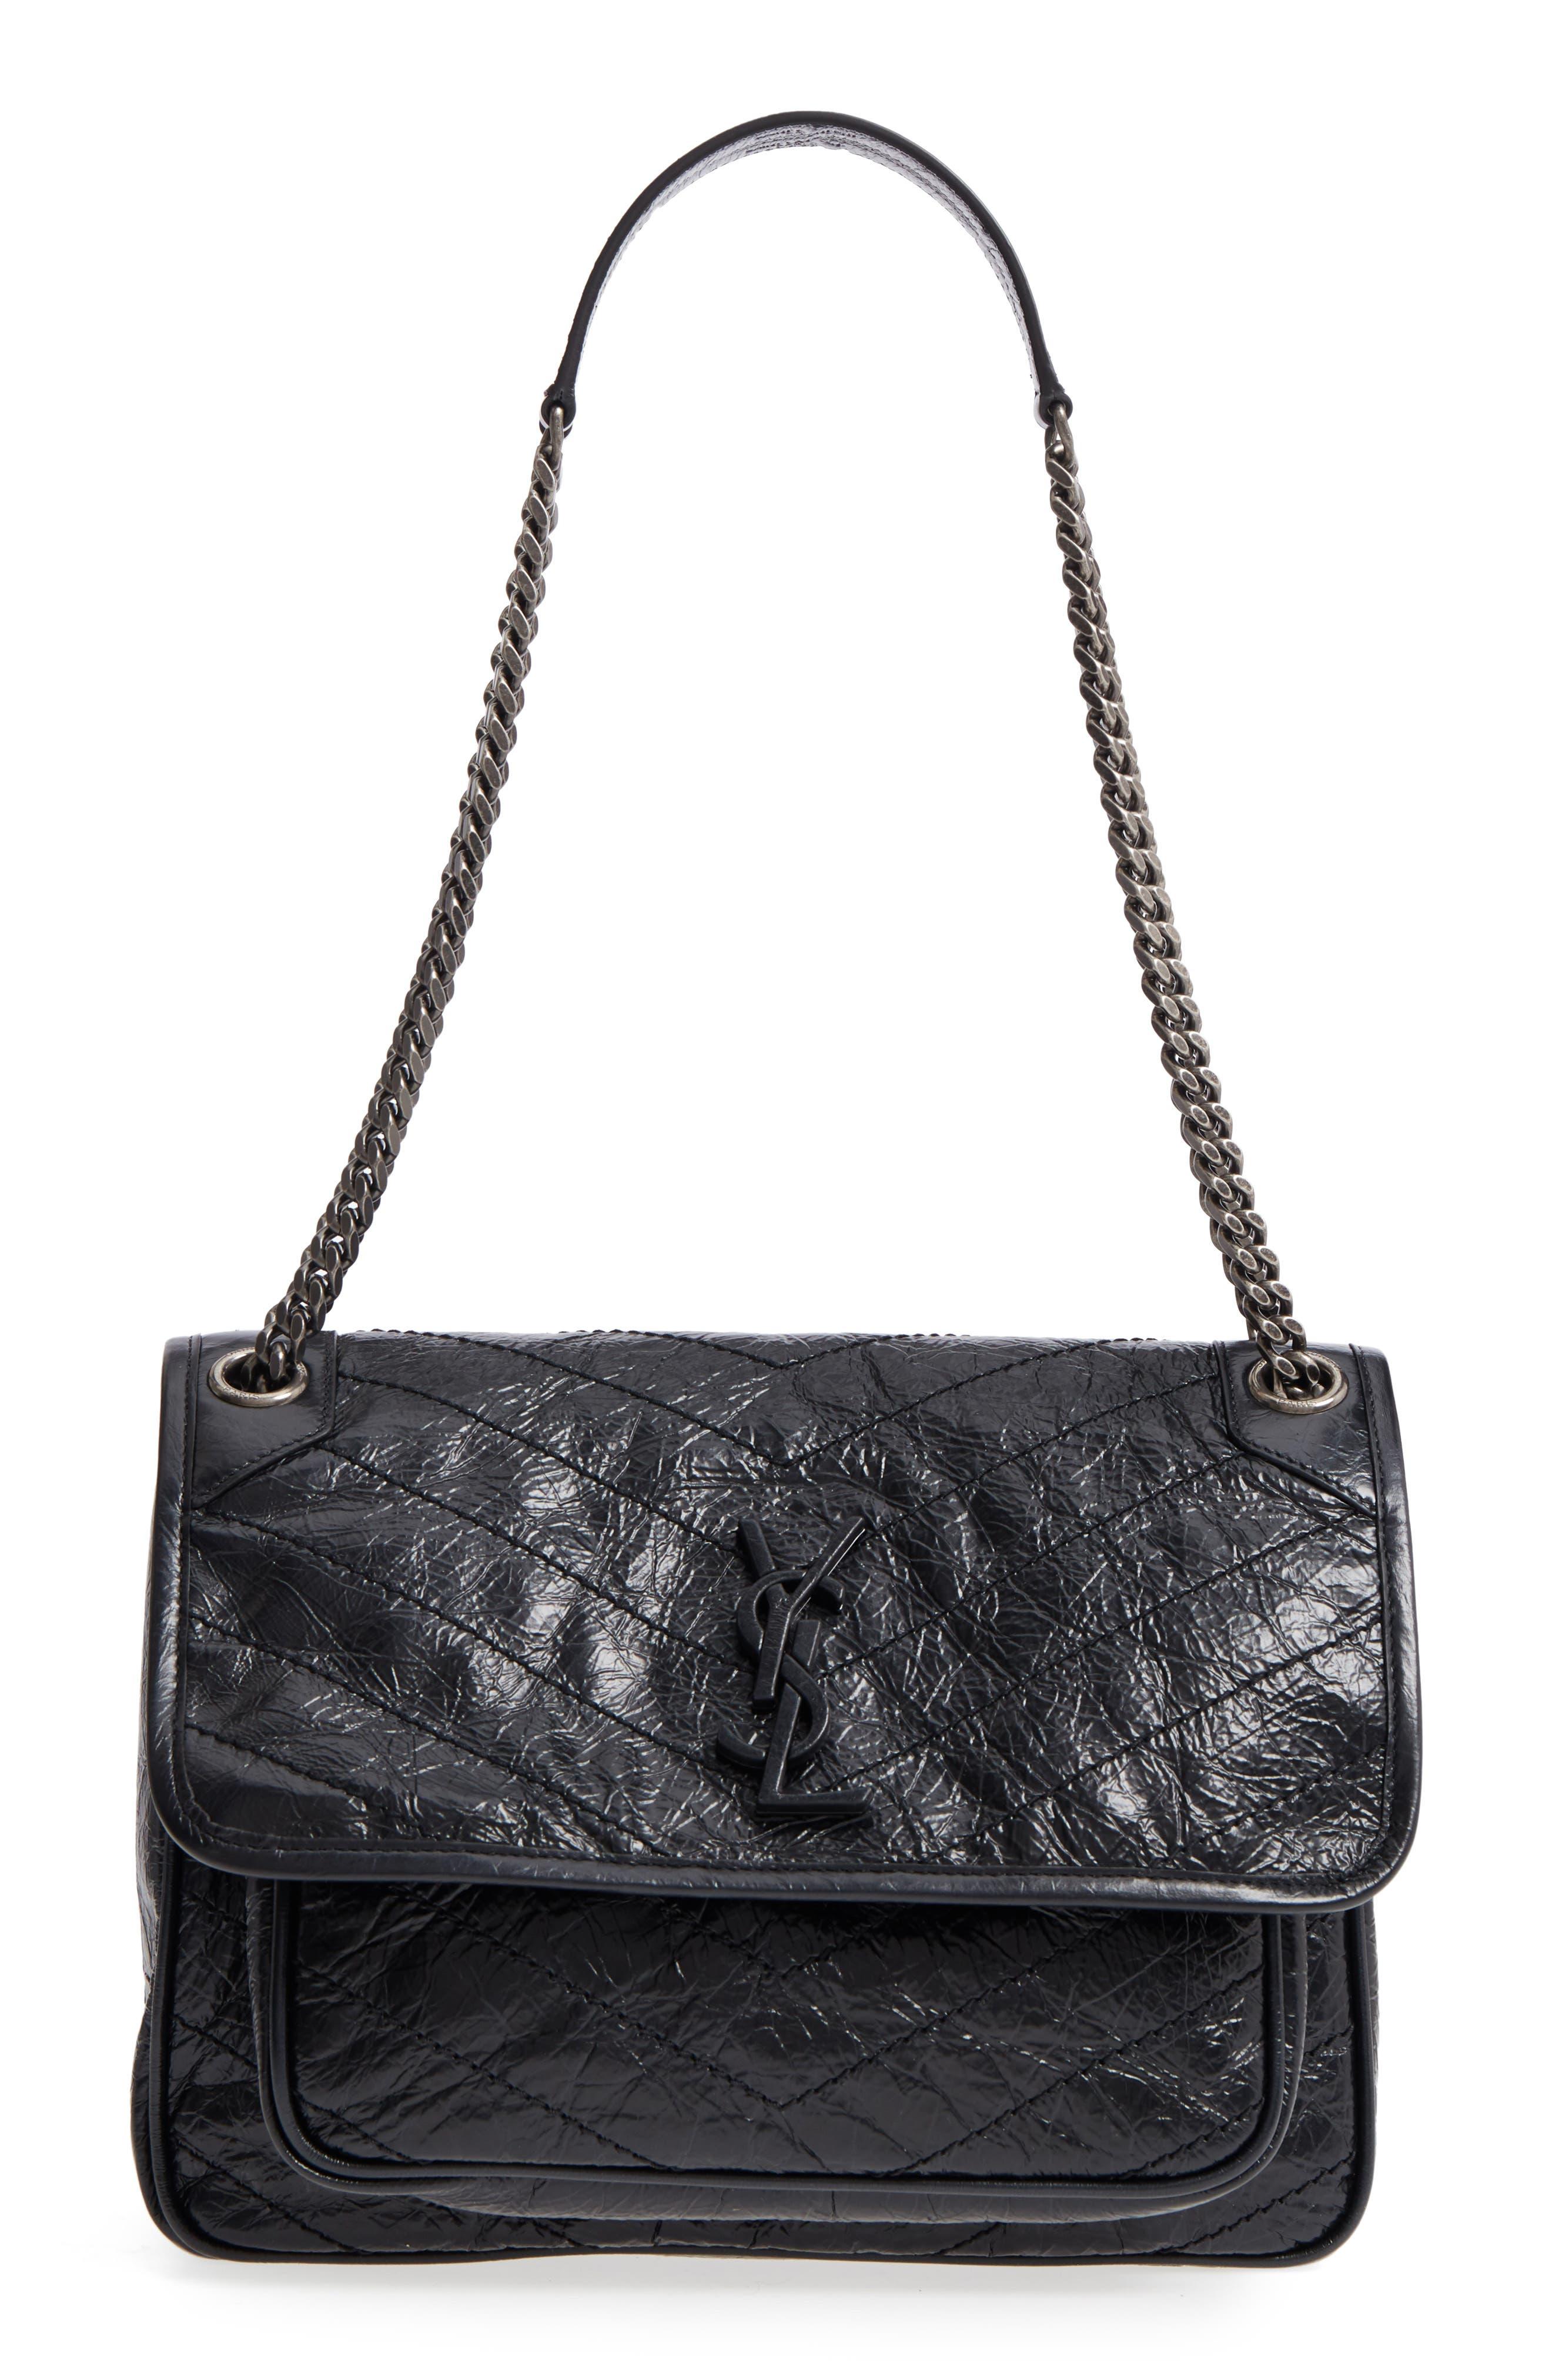 Medium Niki Leather Shoulder Bag,                             Main thumbnail 1, color,                             BLACK